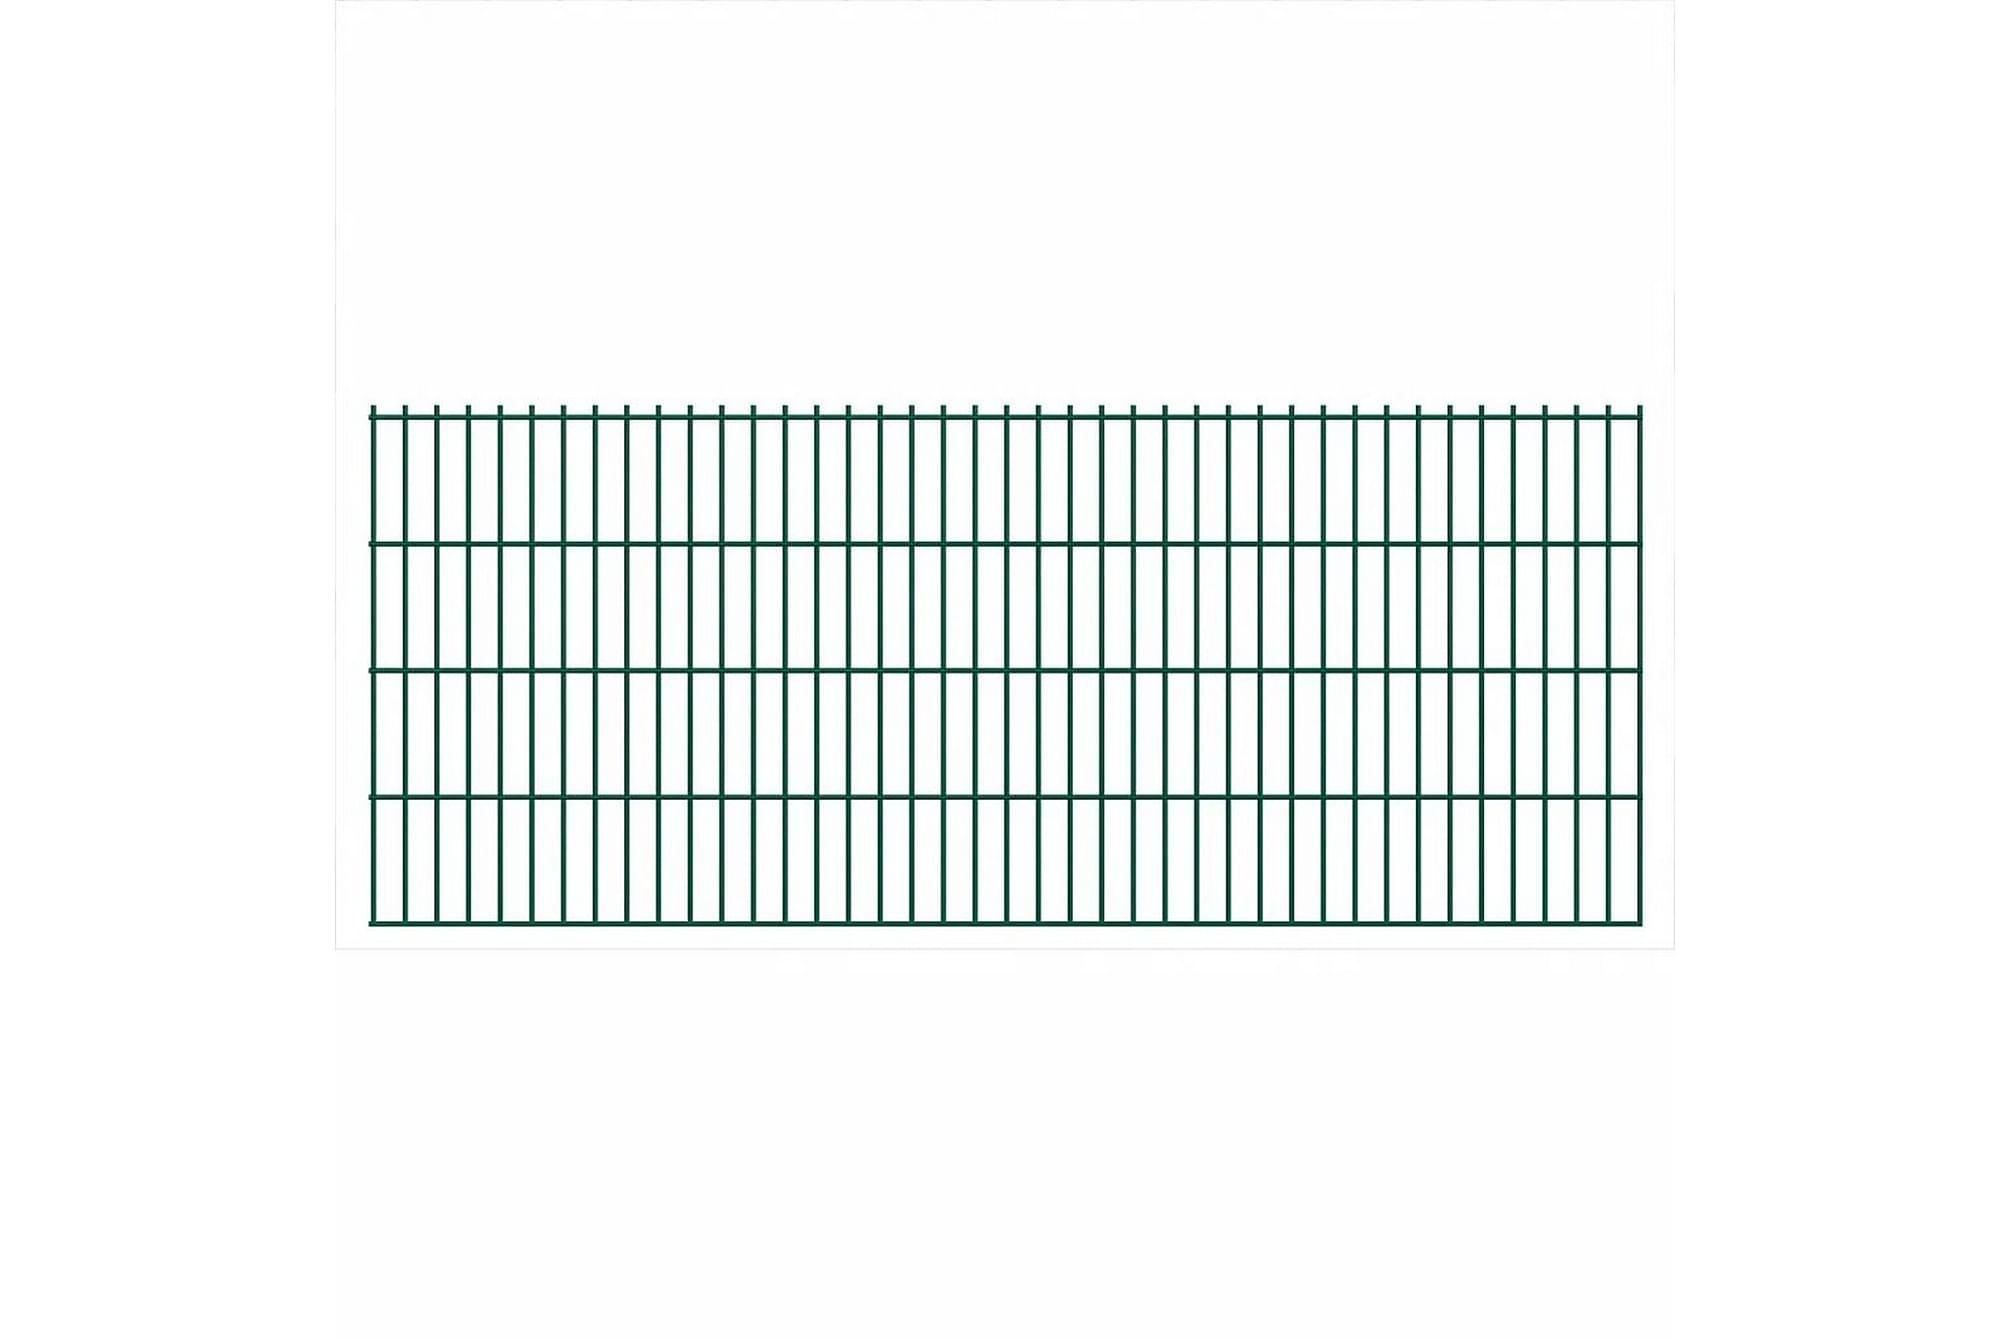 2D Stängselpanel 2008×830 mm Grön